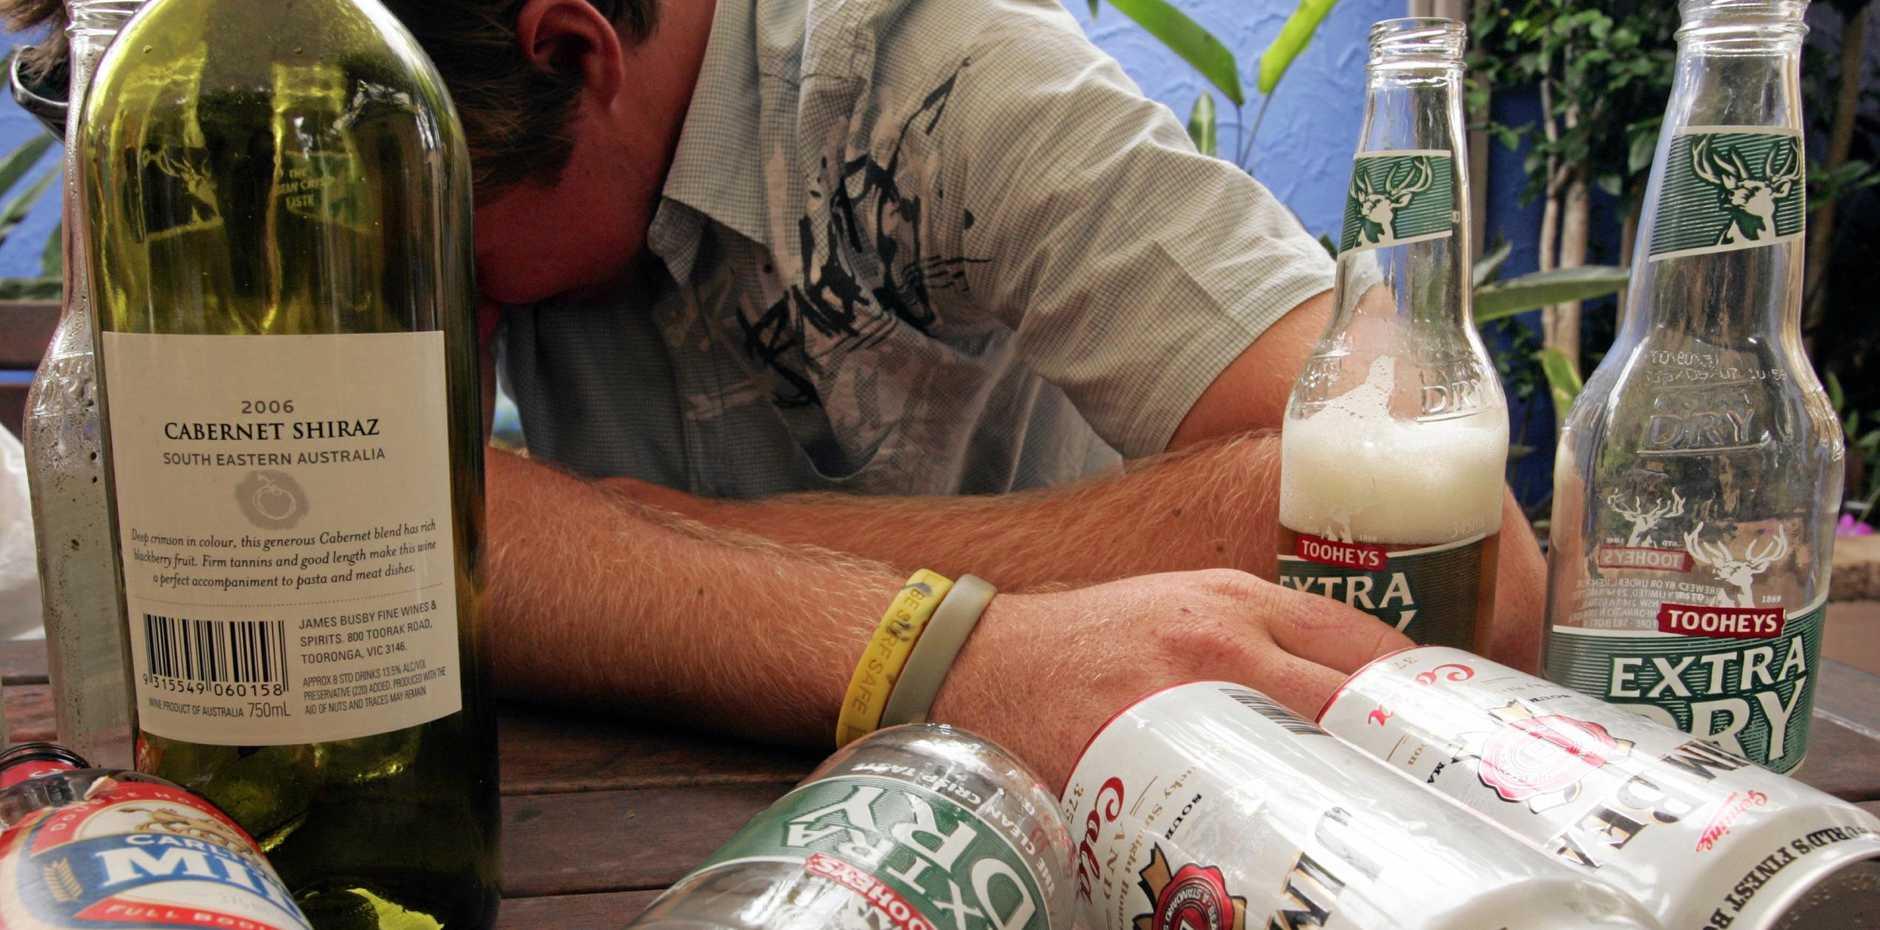 Hangover cure after a big night out.Photo Nicholas Falconer / Sunshine Coast Daily